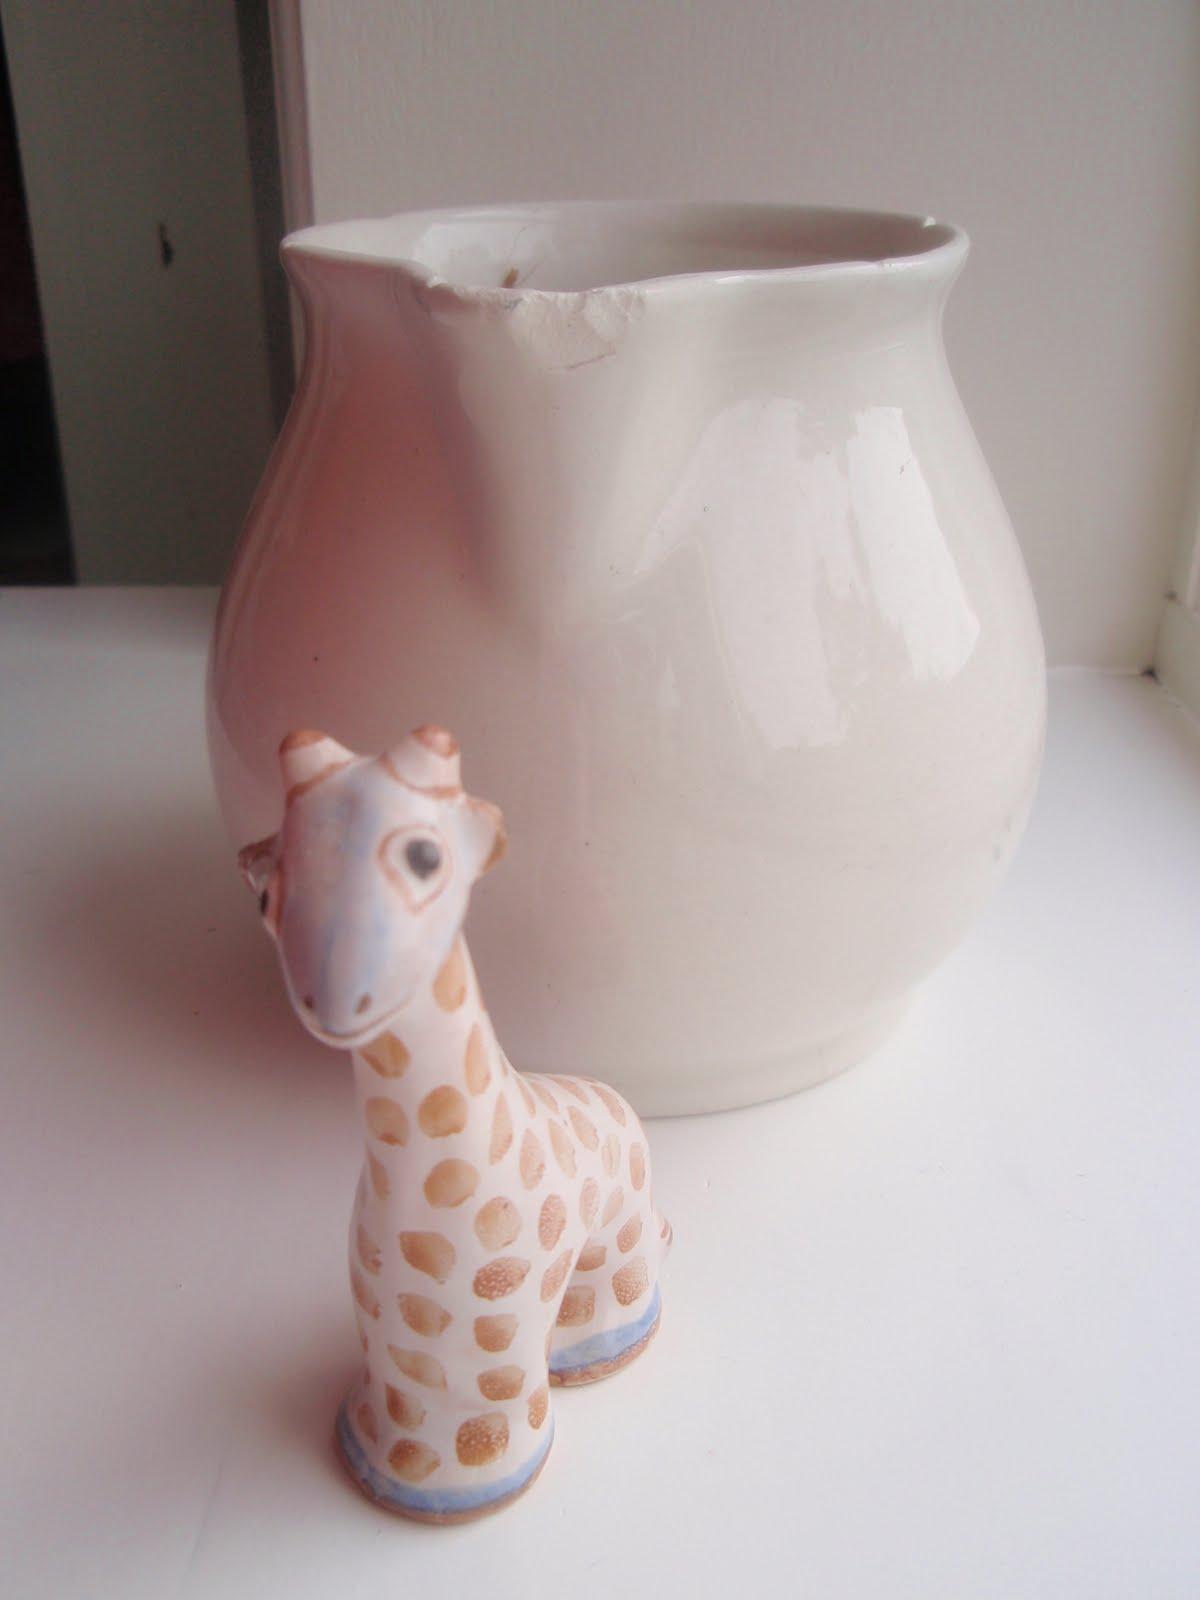 hjorth keramik figurer Loppe shoppe: L. Hjorth, Bornholm hjorth keramik figurer